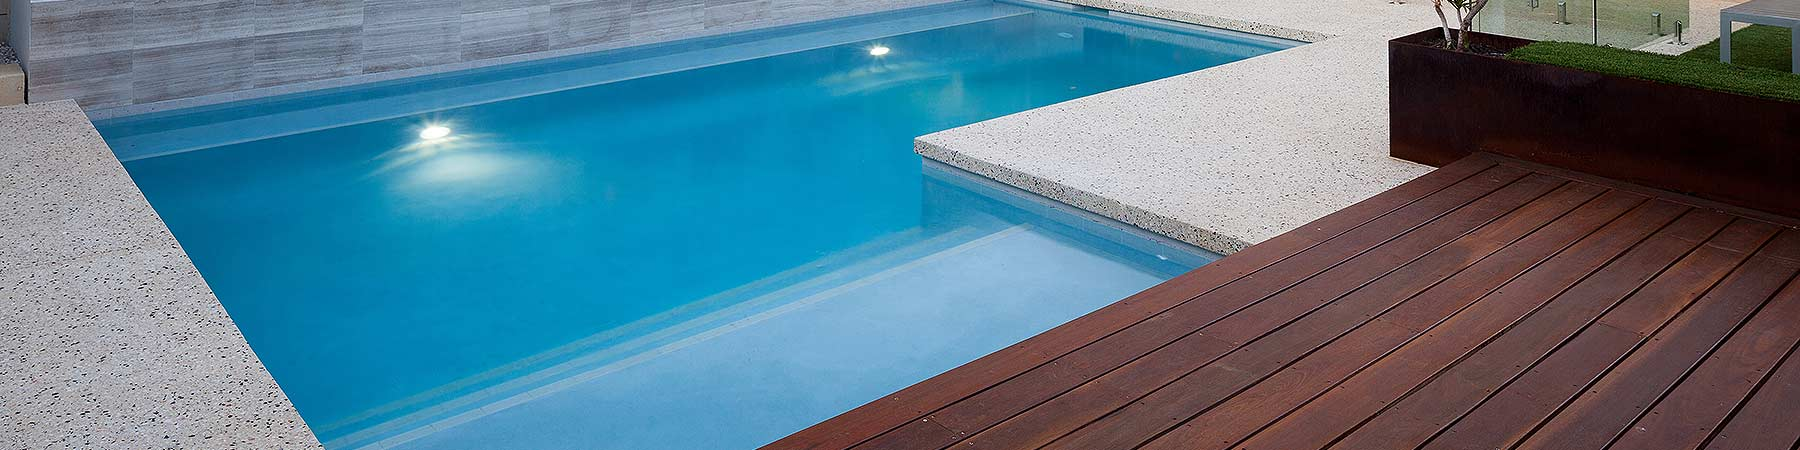 Swimming-Pool-Interior-Pool-Blue